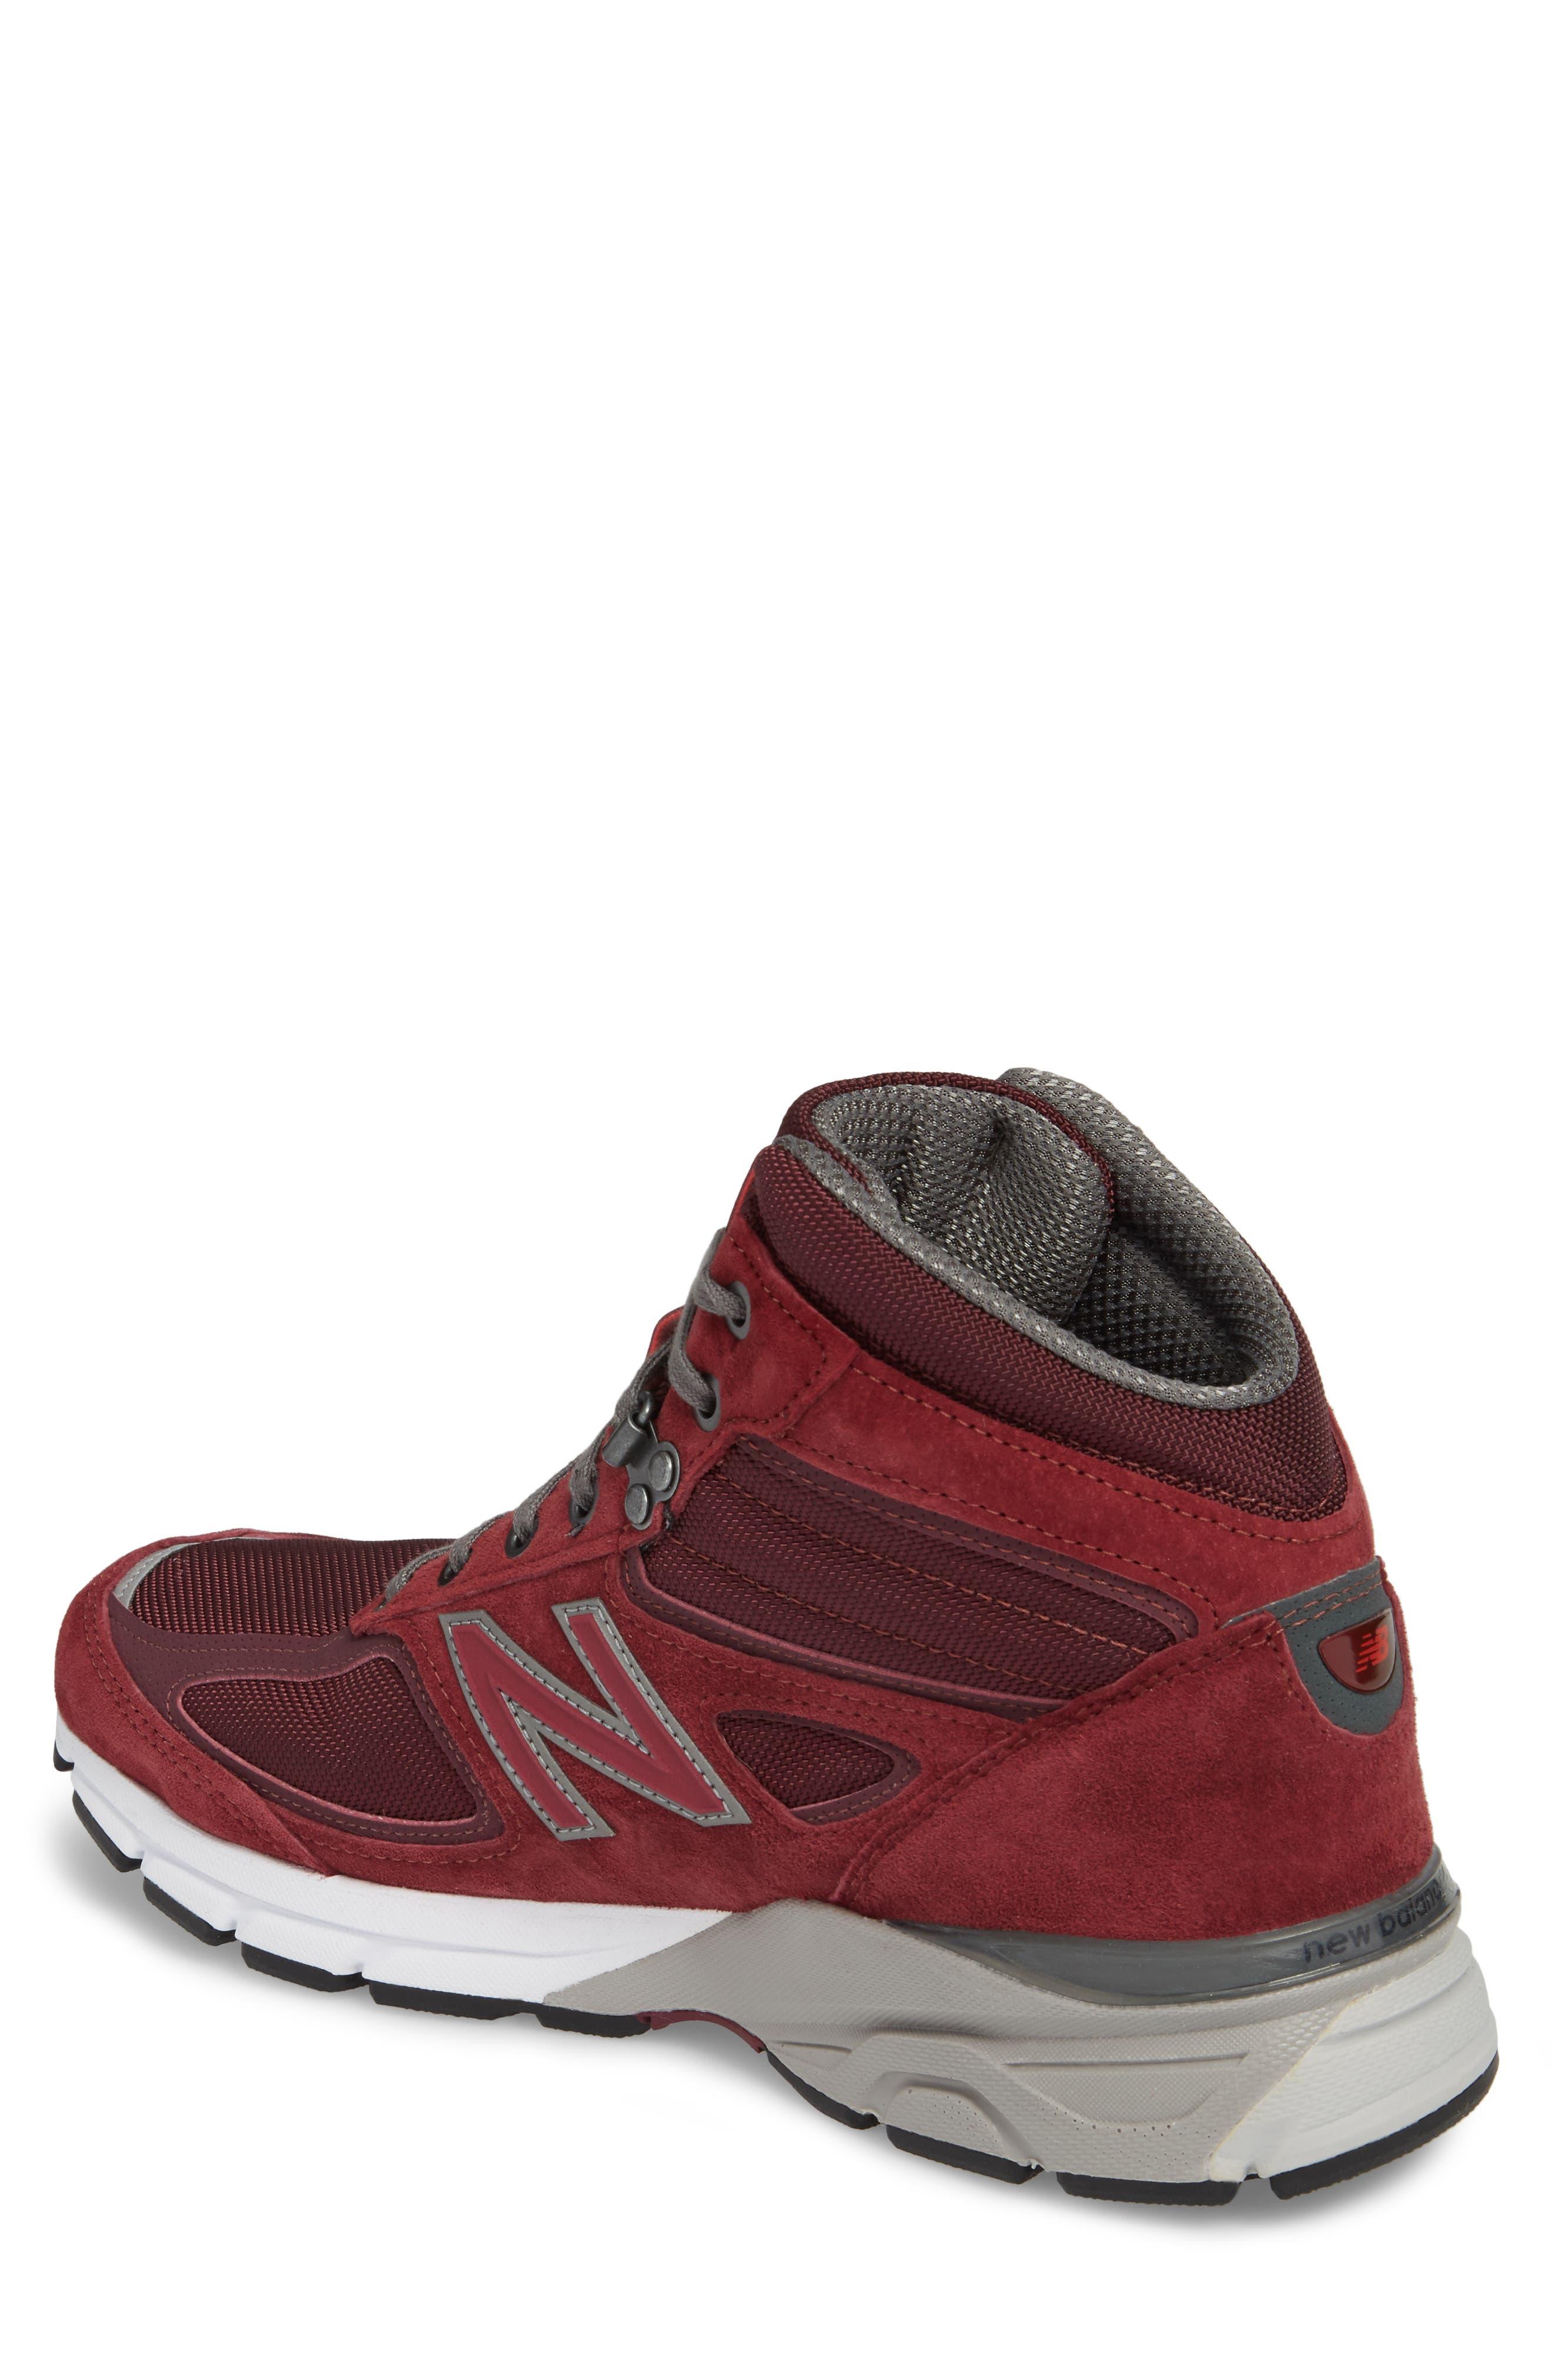 990v4 Water Resistant Sneaker Boot,                             Alternate thumbnail 2, color,                             932